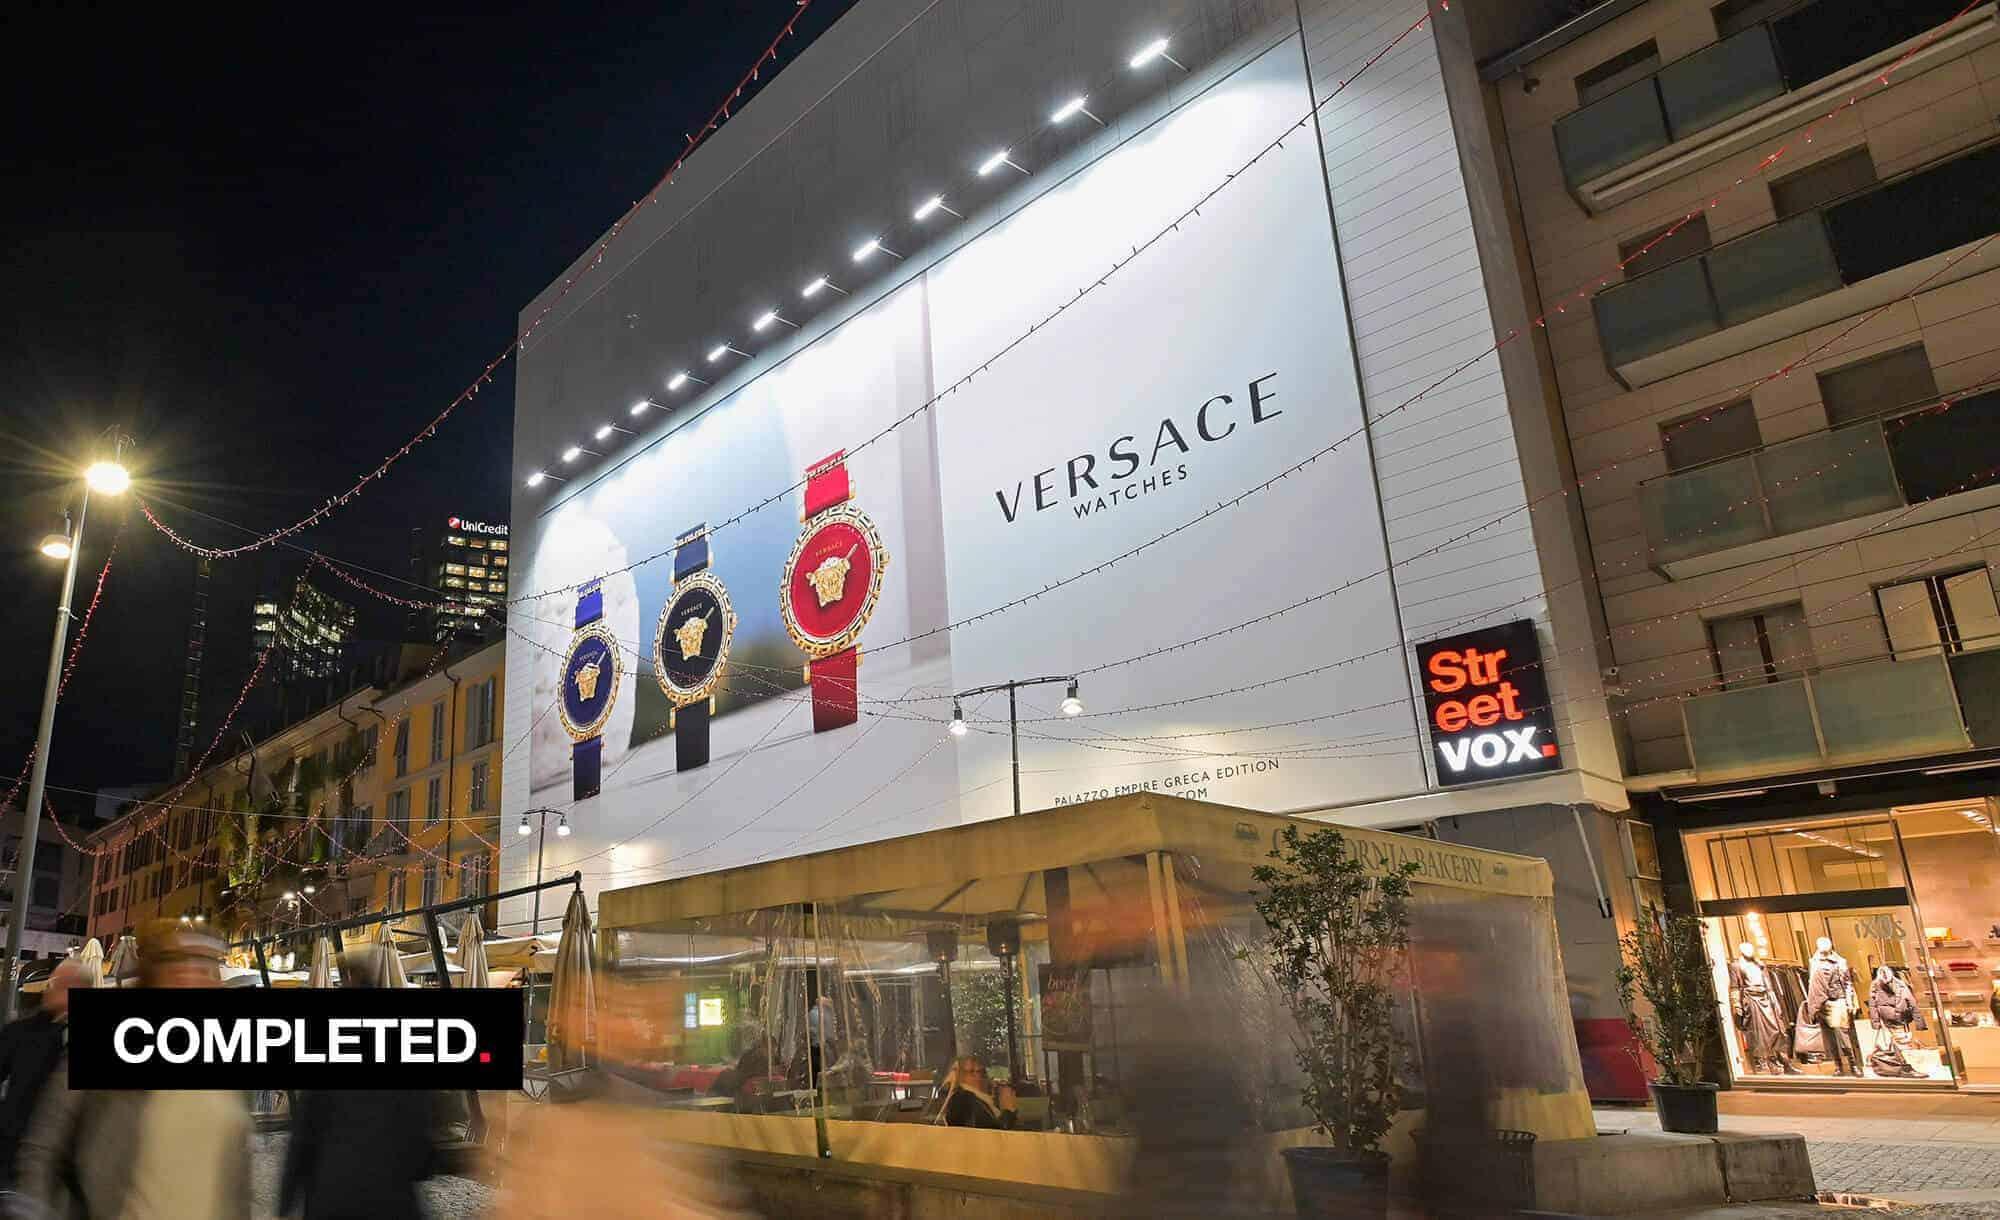 Maxi Affisione a Milano in Corso Como 6 con Versace Watches (Luxury)